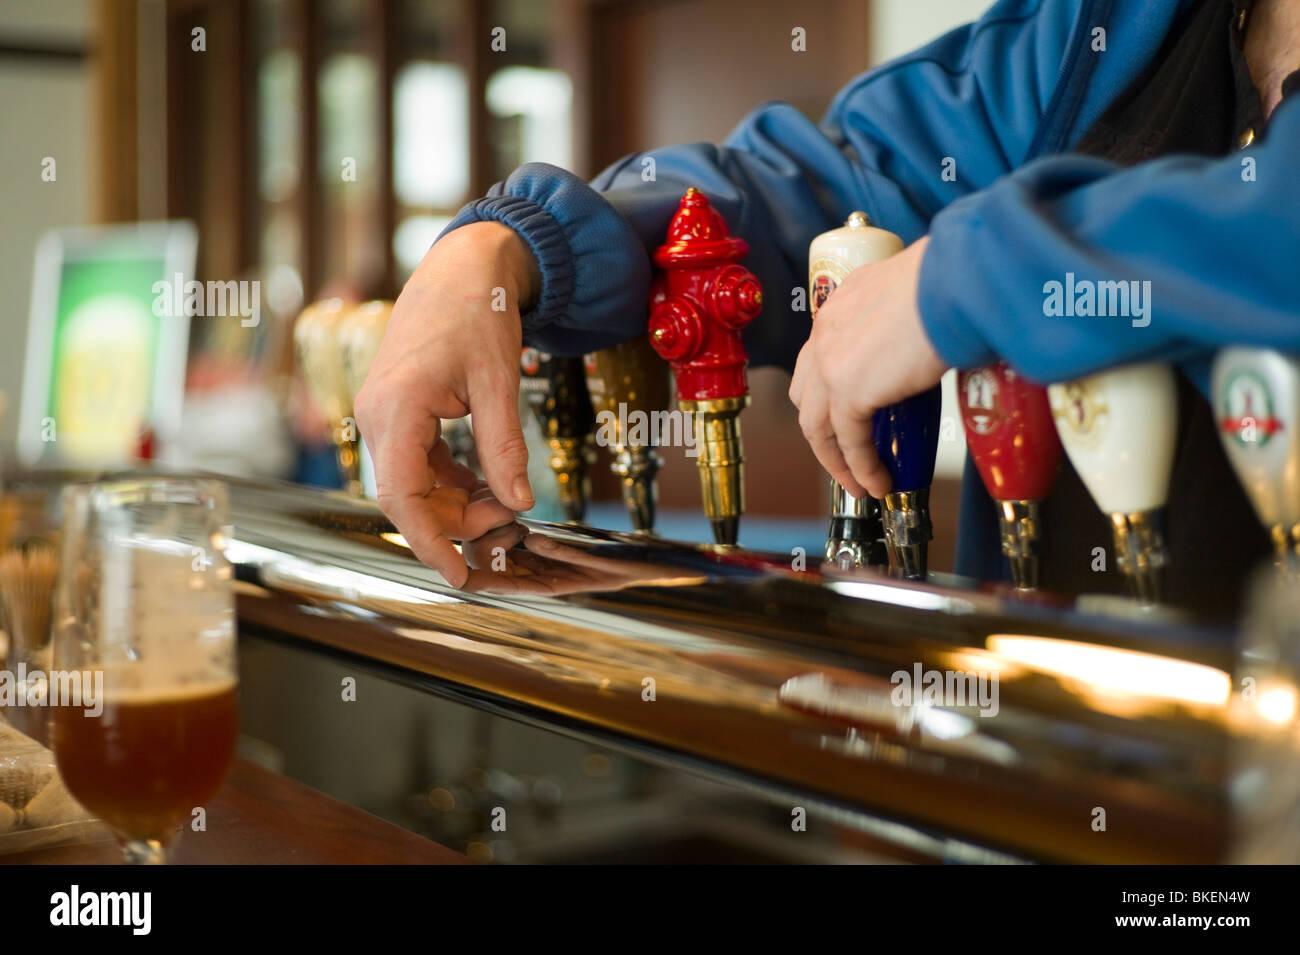 Bartender's hands resting on beer taps. - Stock Image